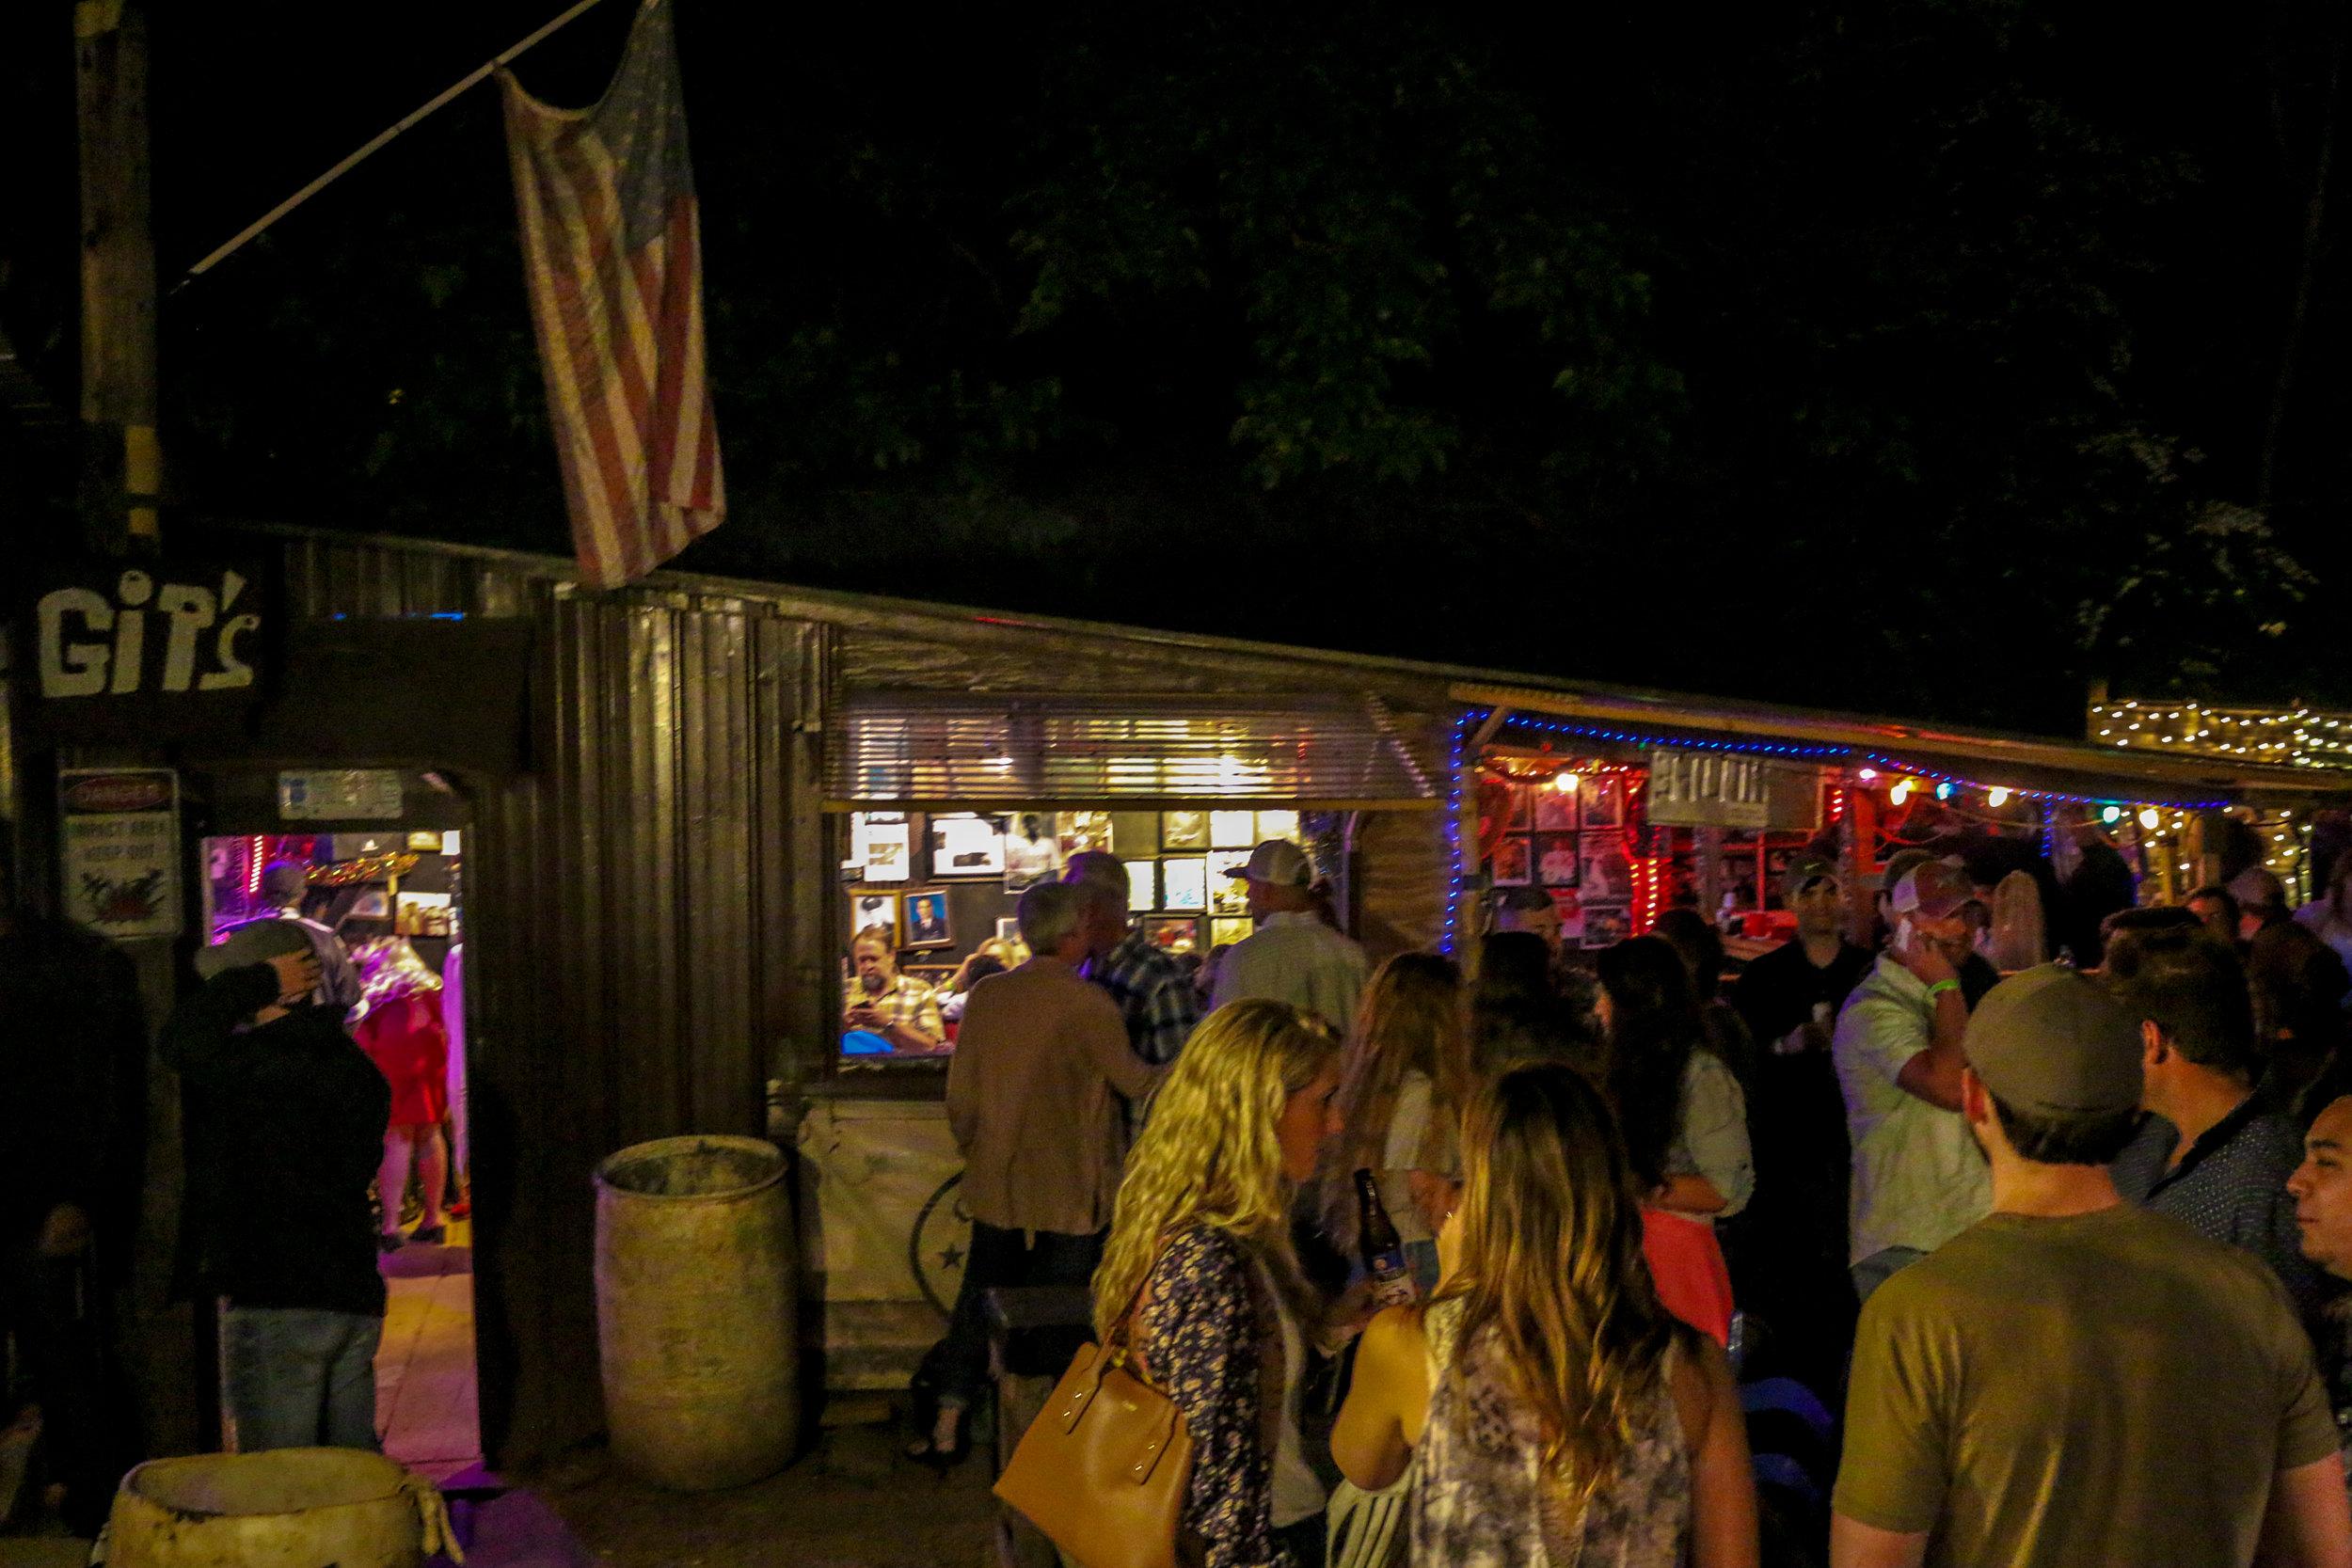 Gip's Place Juke Joint Bessemer Alabama